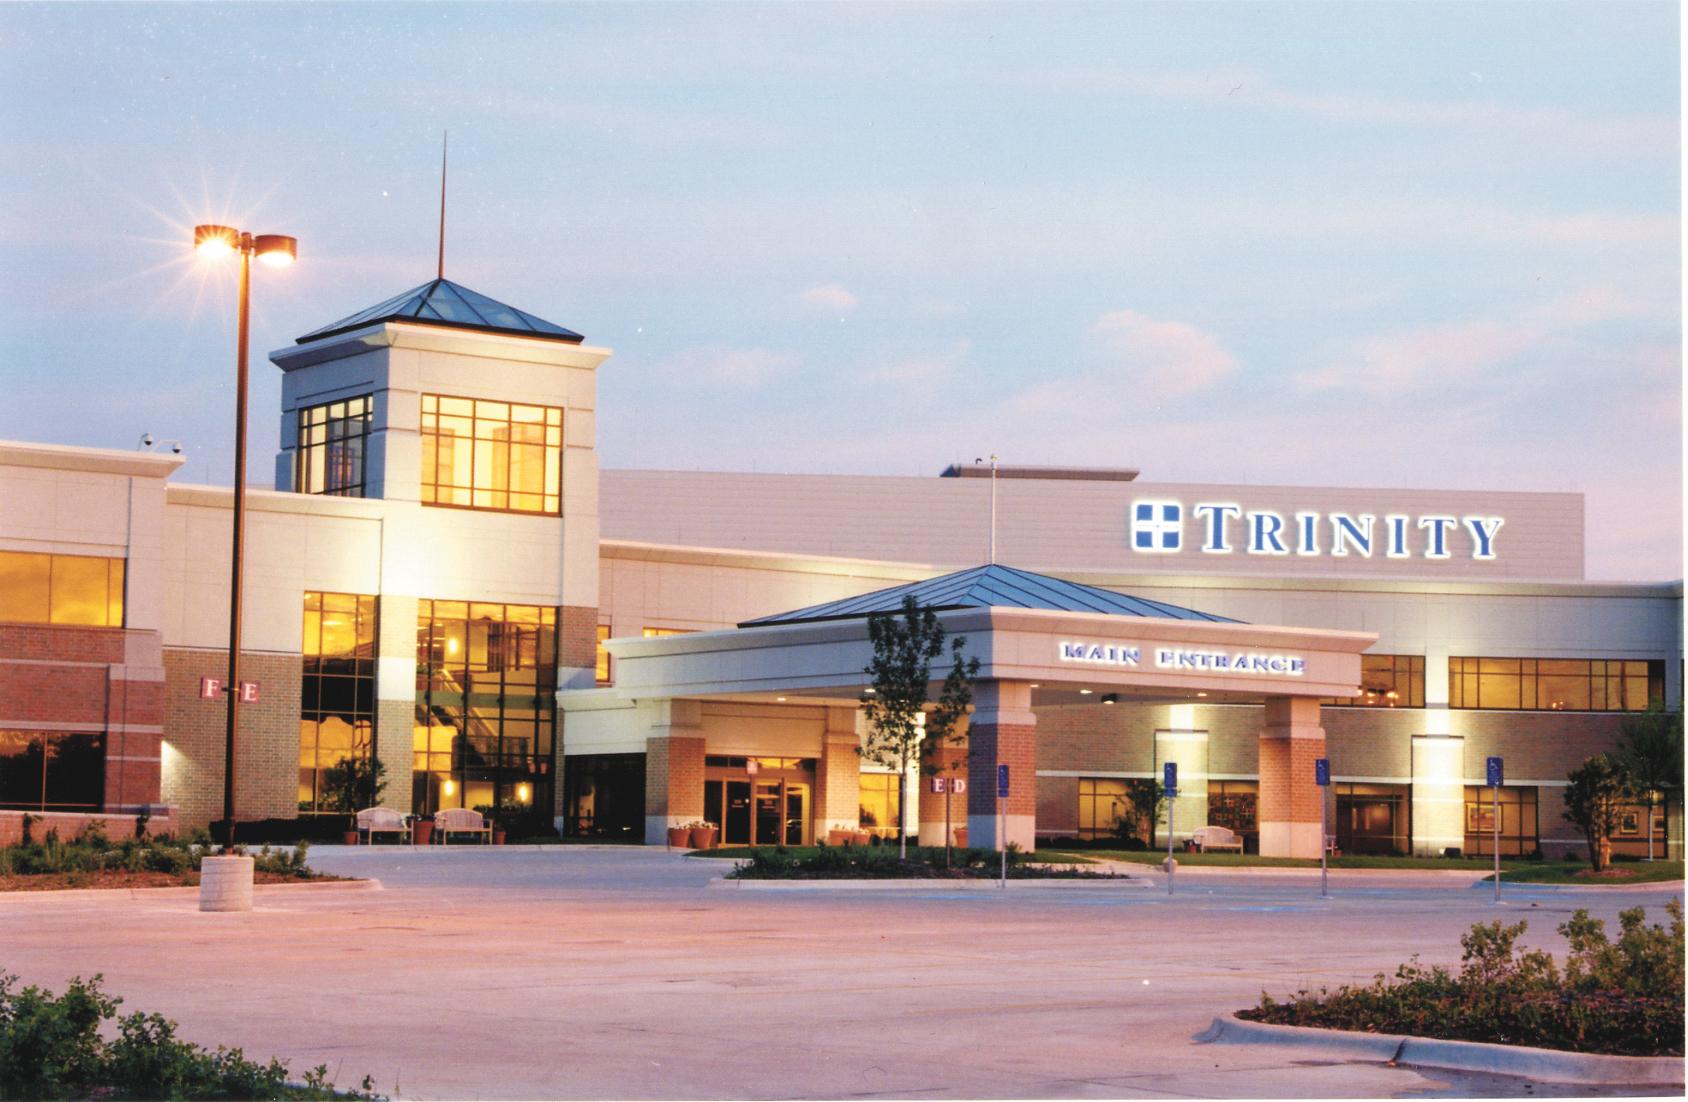 Trinity Regional Health Sytem - Bettendorf Image